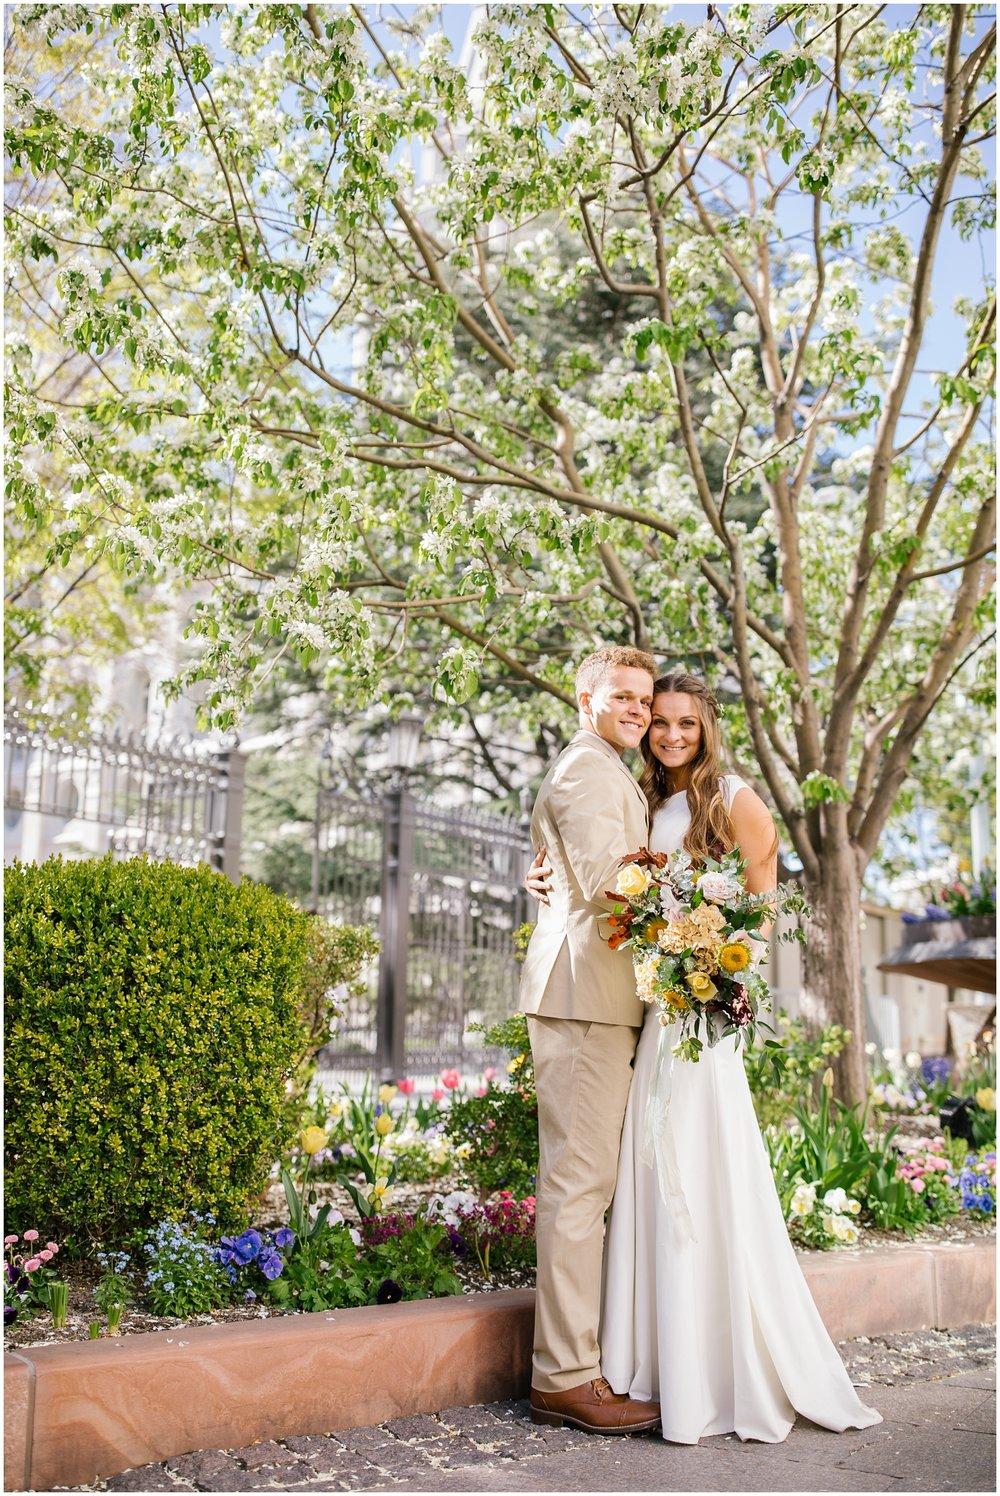 JC-Wedding-192_Lizzie-B-Imagery-Utah-Wedding-Photographer-Park-City-Salt-Lake-City-Temple-Joseph-Smith-Memorial-Building-Empire-Room.jpg